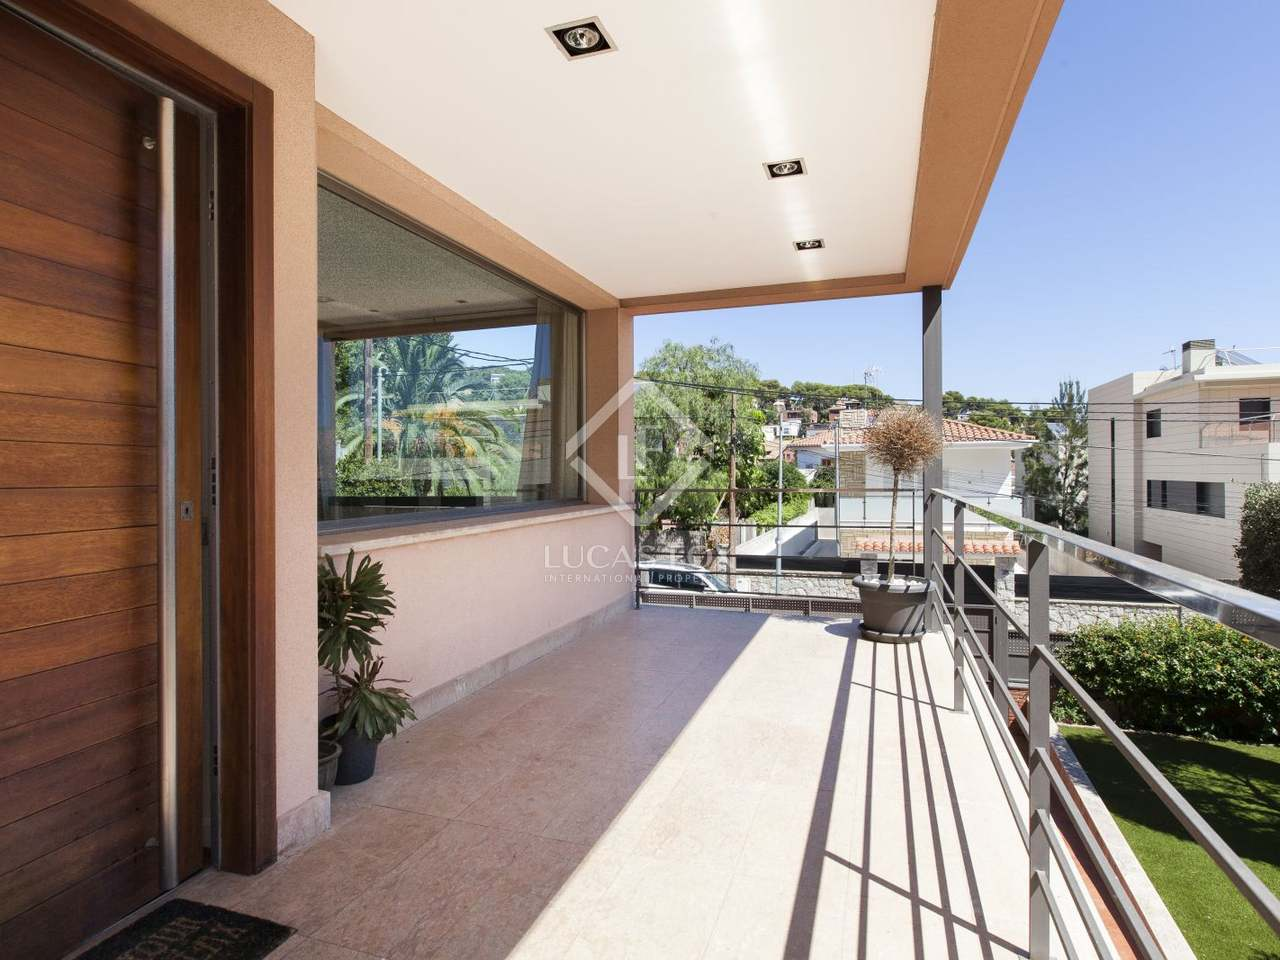 Villa con jard n y piscina en alquiler en castelldefels for Alquiler casa jardin barcelona